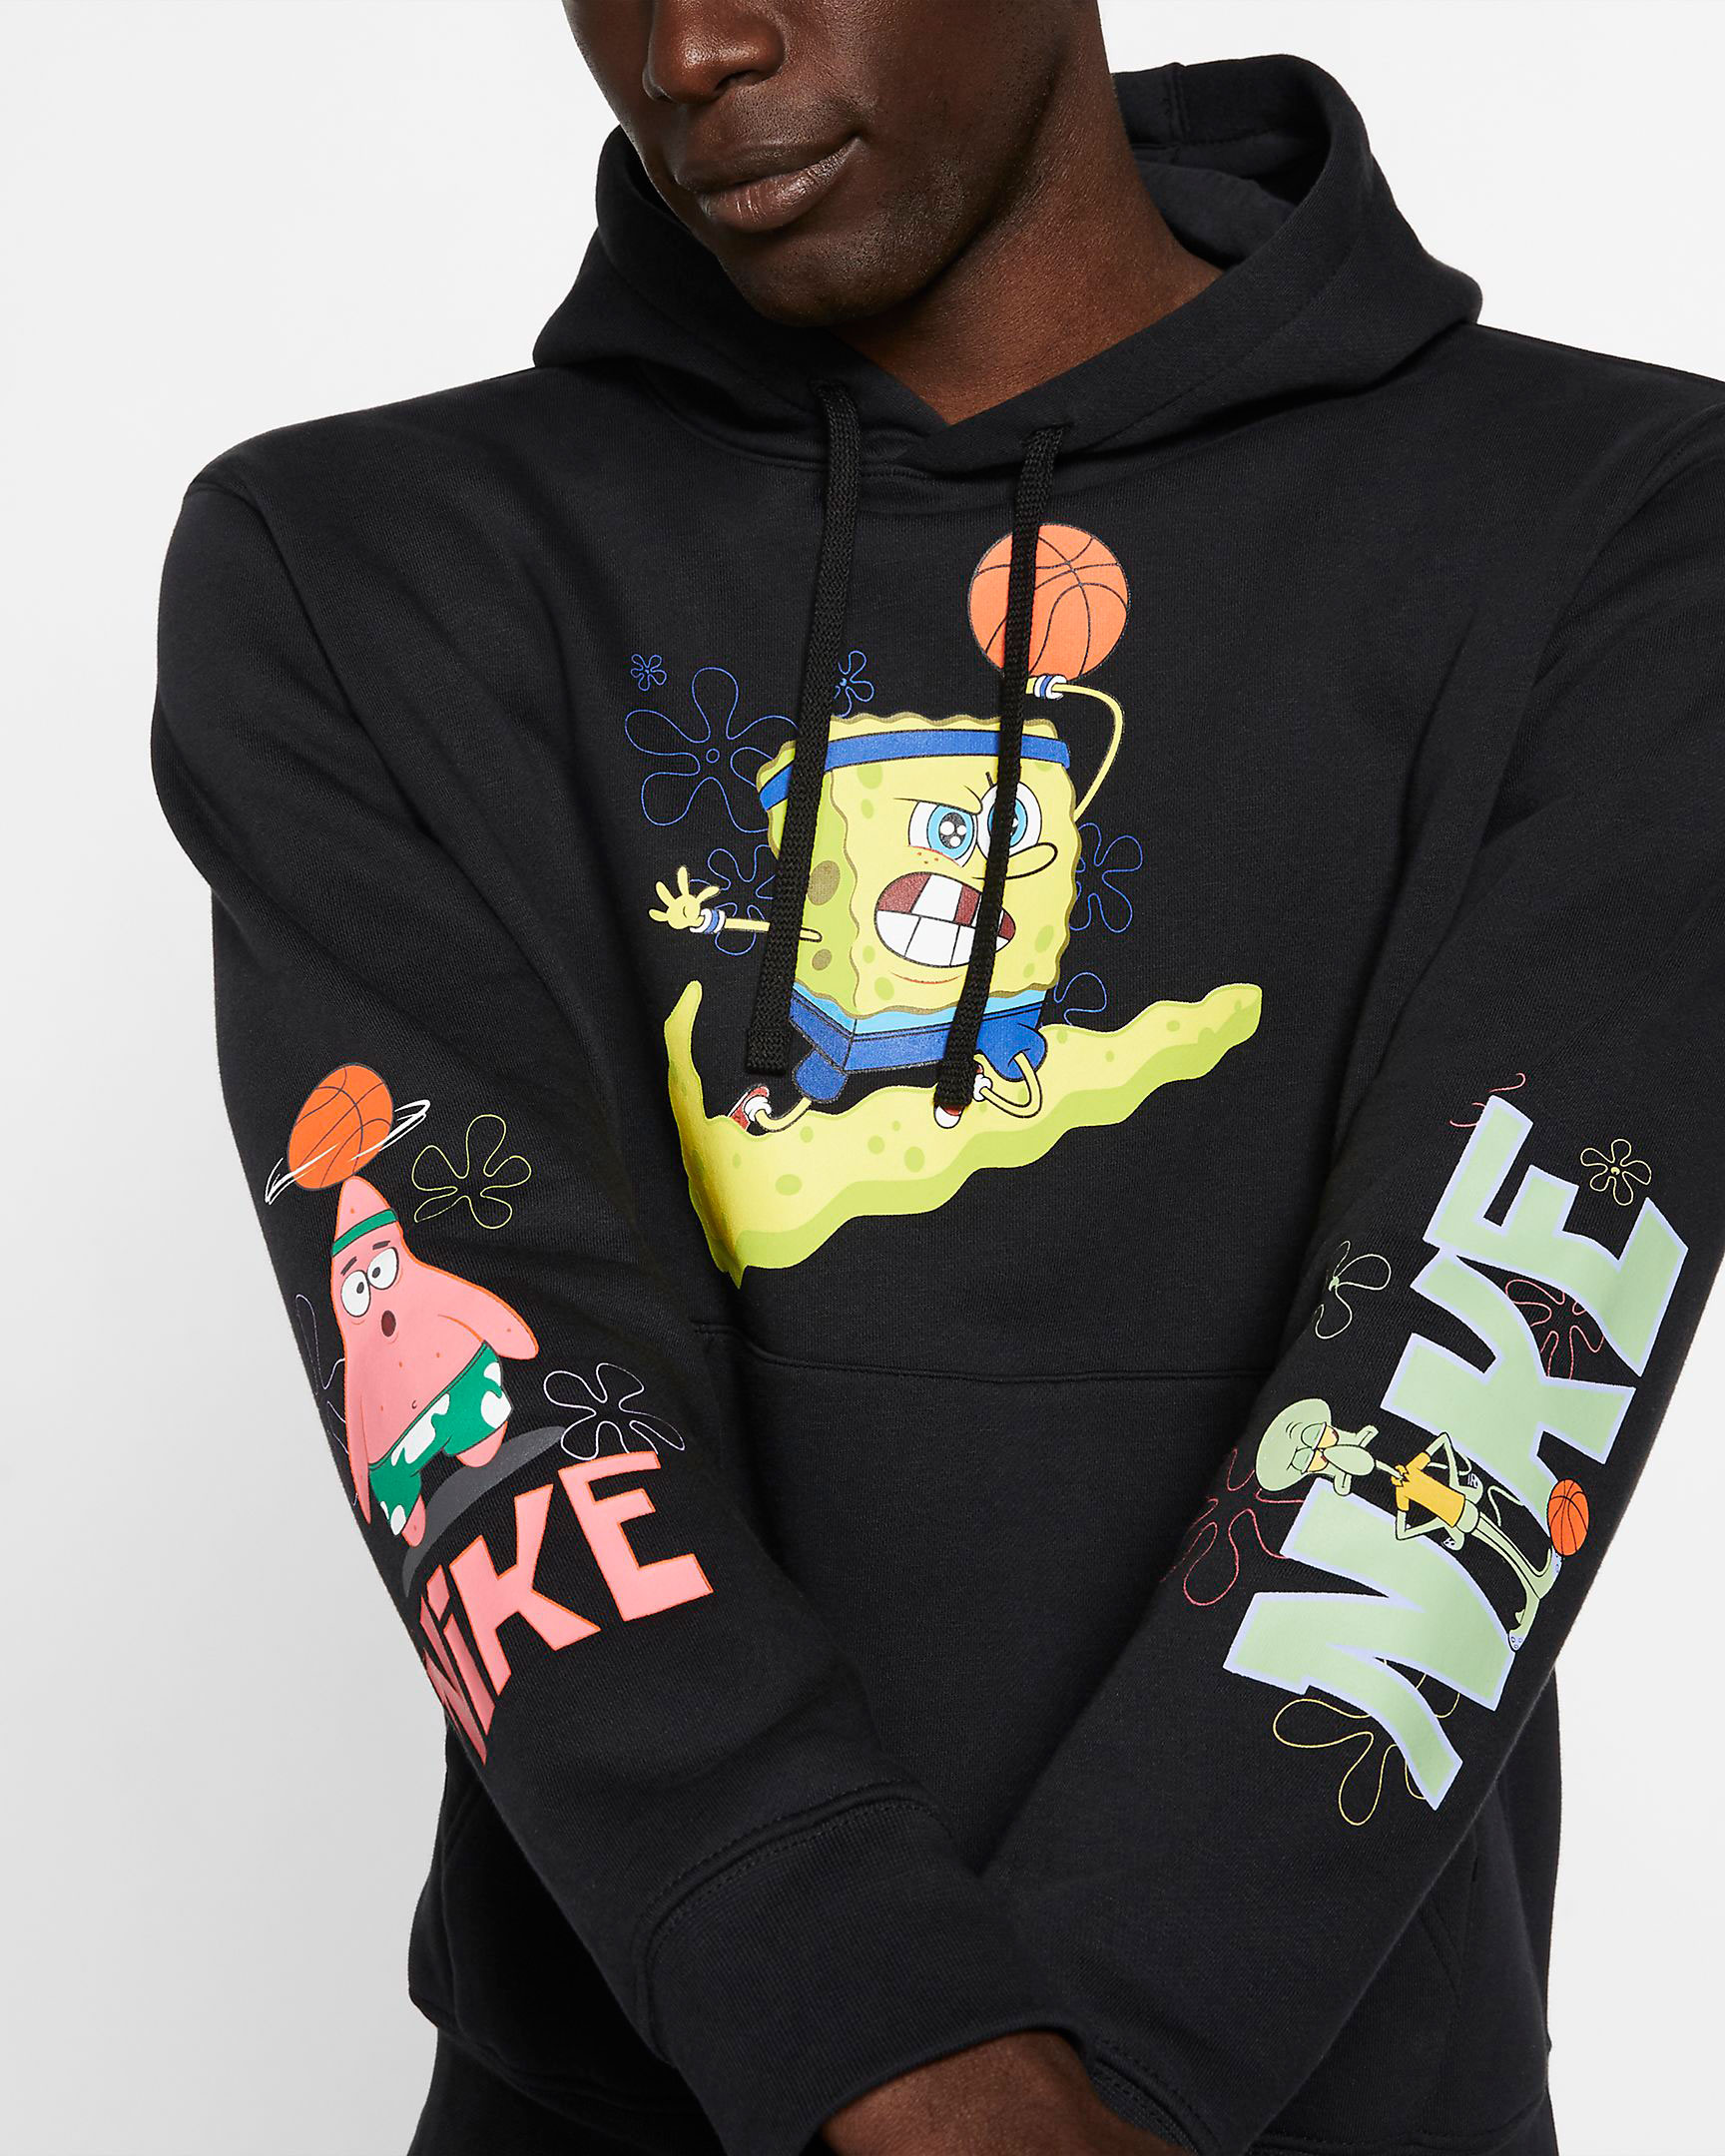 Nike Spongebob Hoodie Yellow BritishTown Yabancı Dil Kursu